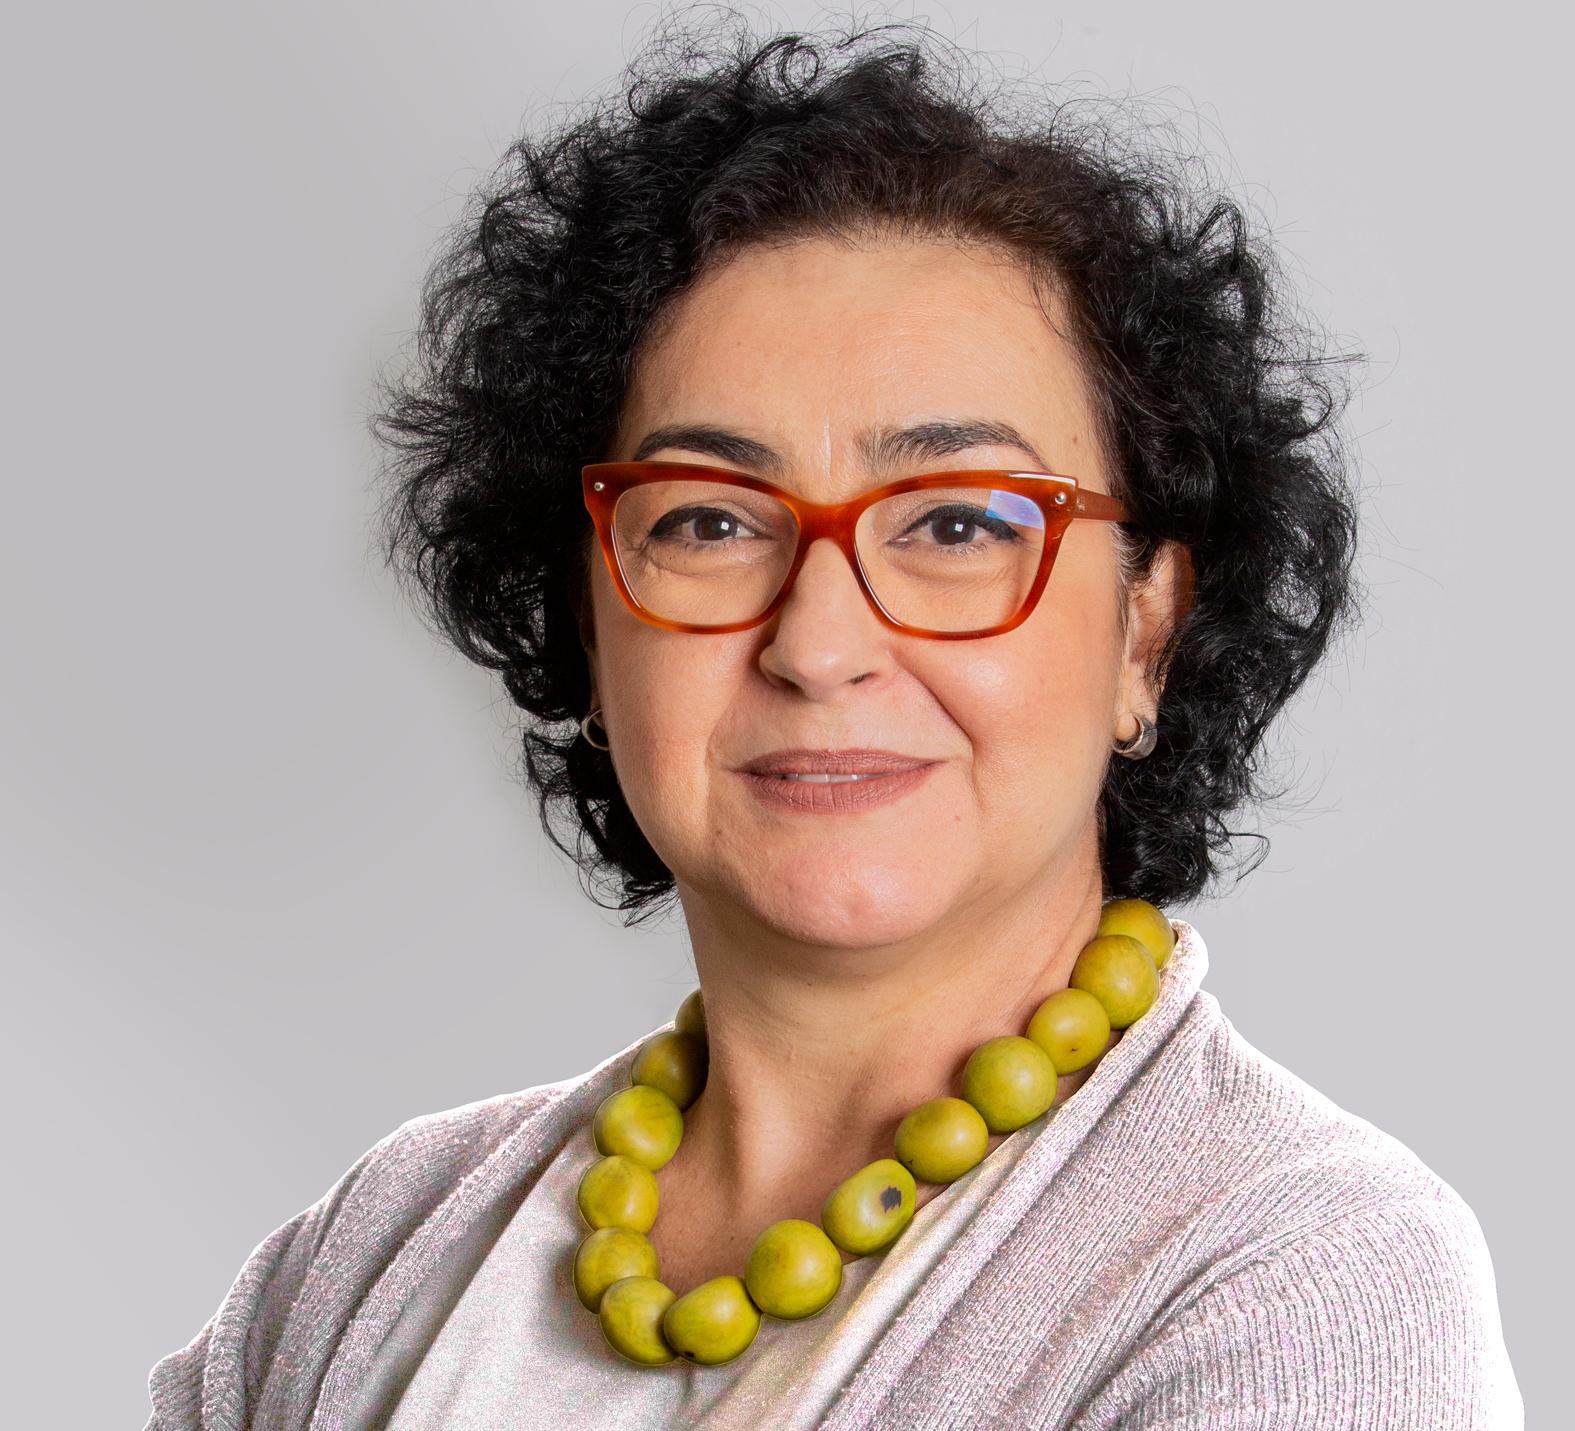 Maristela Fernandes